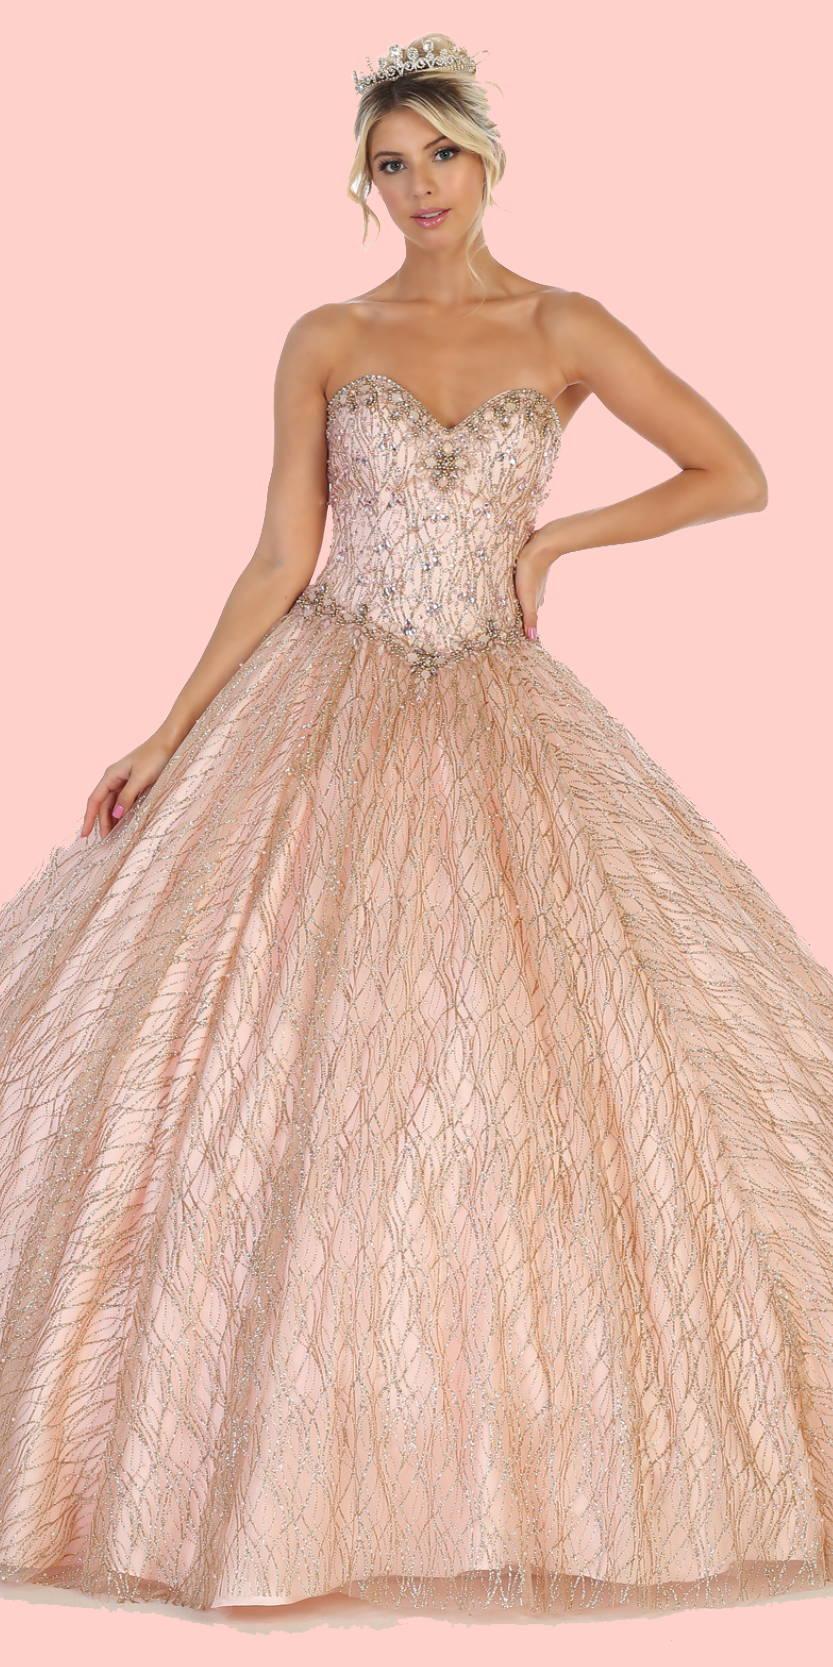 a6988140a643 Party Dresses & Wedding Dresses, Prom & Grade 8 Grad Dresses ...